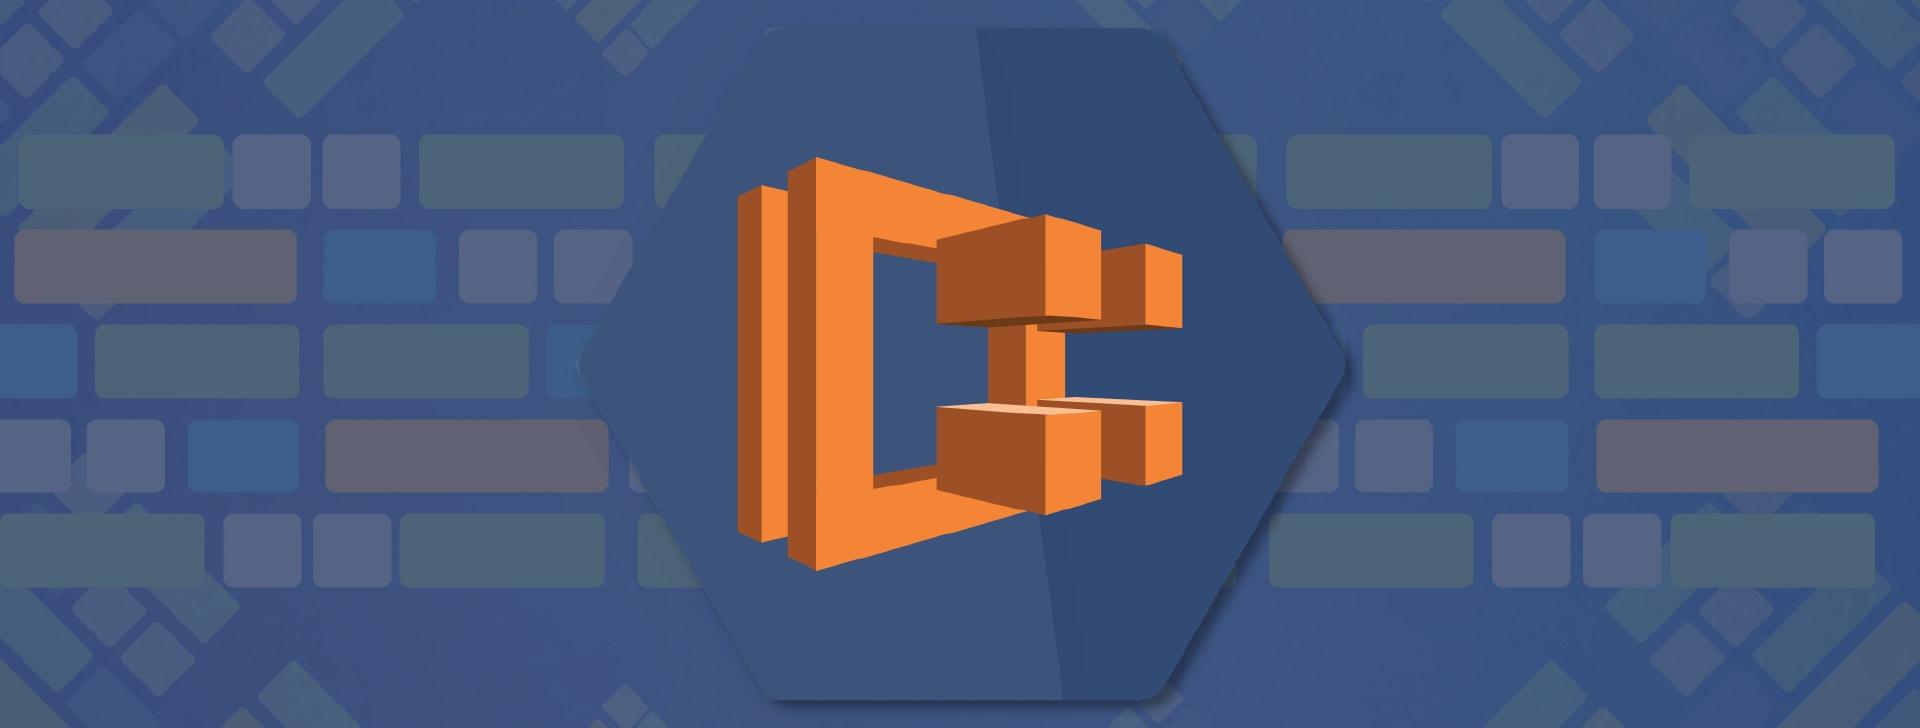 Elastigroup & Amazon EC2 Container Service (ECS) – Integration That Makes Sense